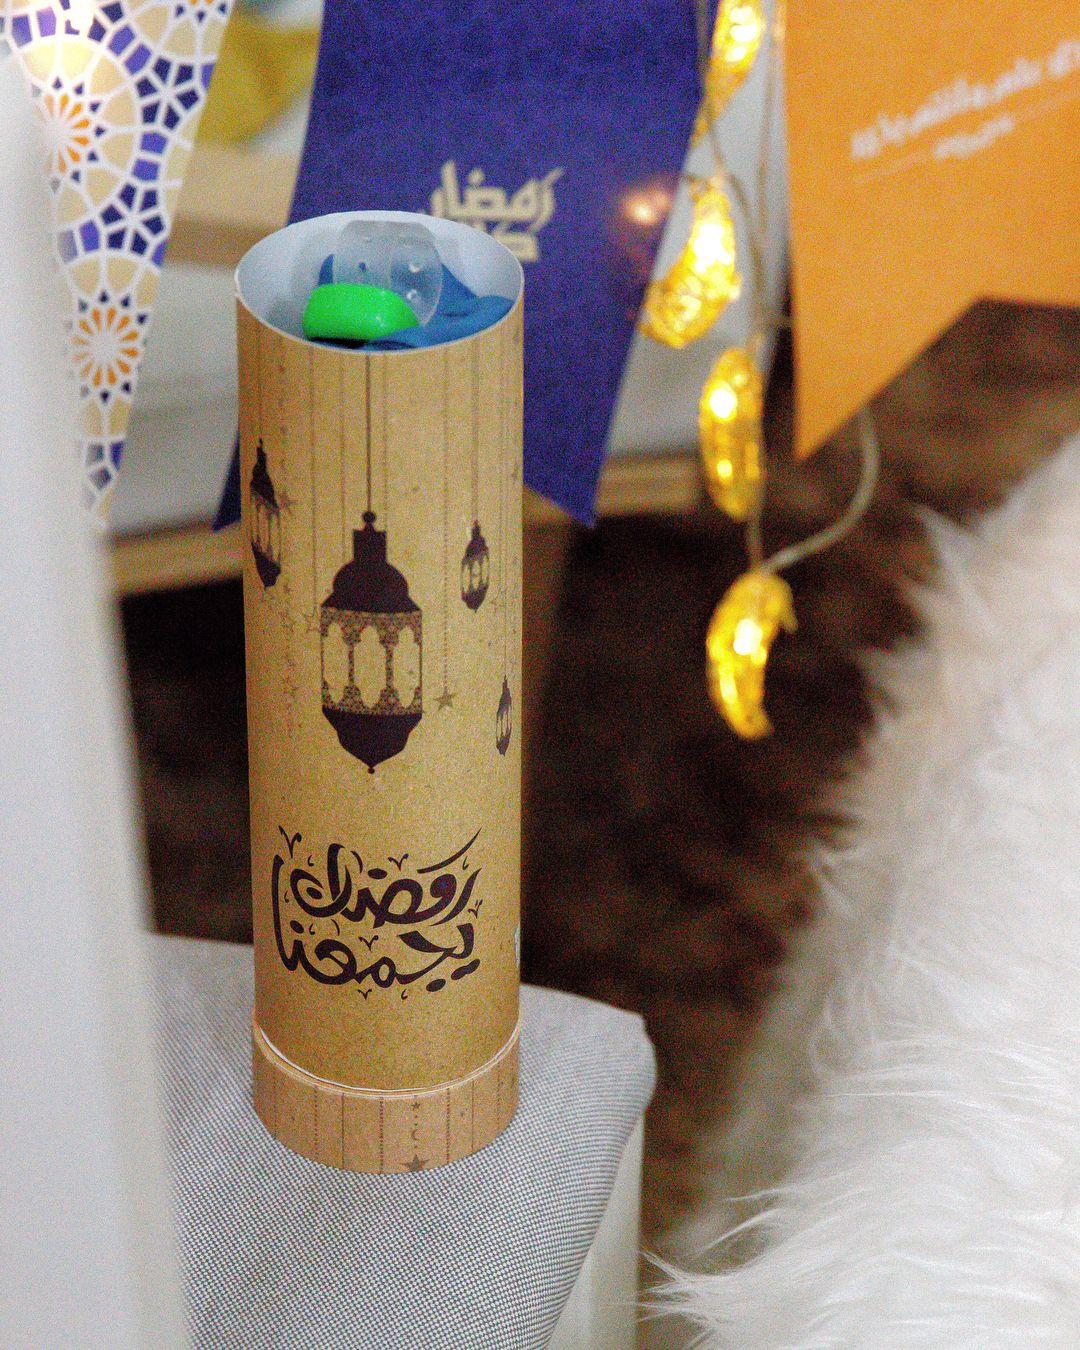 Themat On Instagram ثيمات مواليد جديده ثيمات ملكة ثيمات زواج ثيمات خطوبة ثيمات تخرج ثيمات Christmas Gift Baskets Diy Beauty Box Gift Christmas Gift Baskets